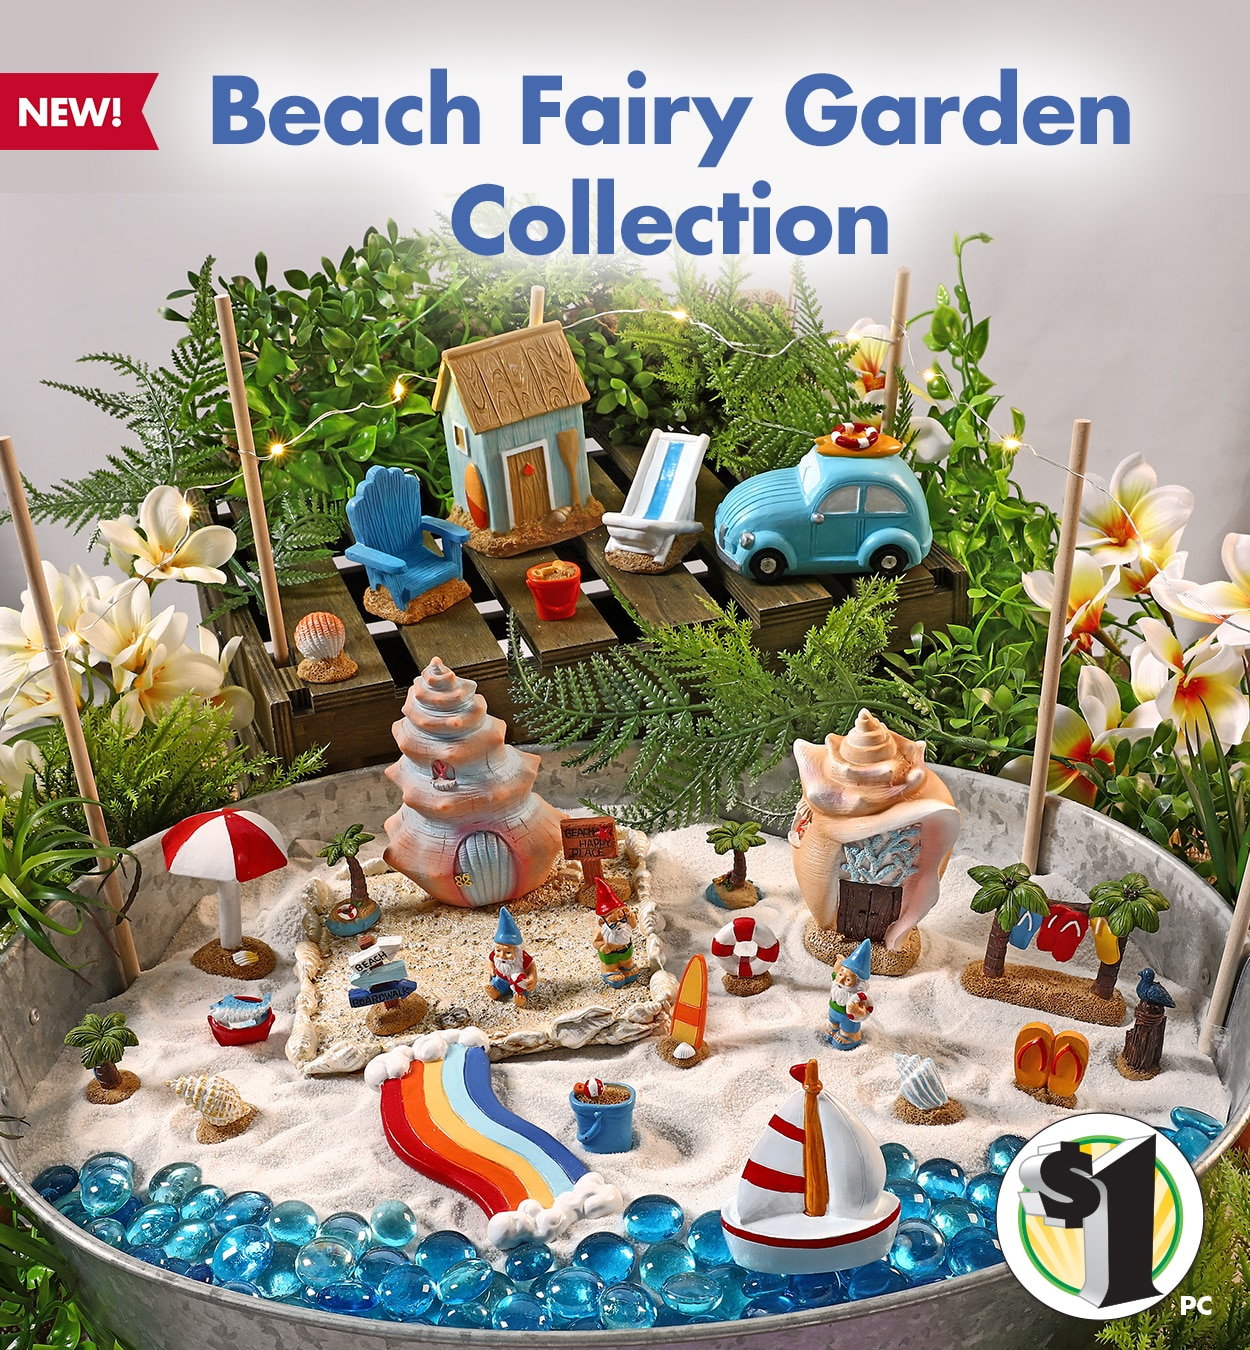 Fall Themed Fairy Garden Kits Terrarium Accessories Unique Floral Decorations Gift Ideas Fall Home Decorations Fairy Garden Accessories